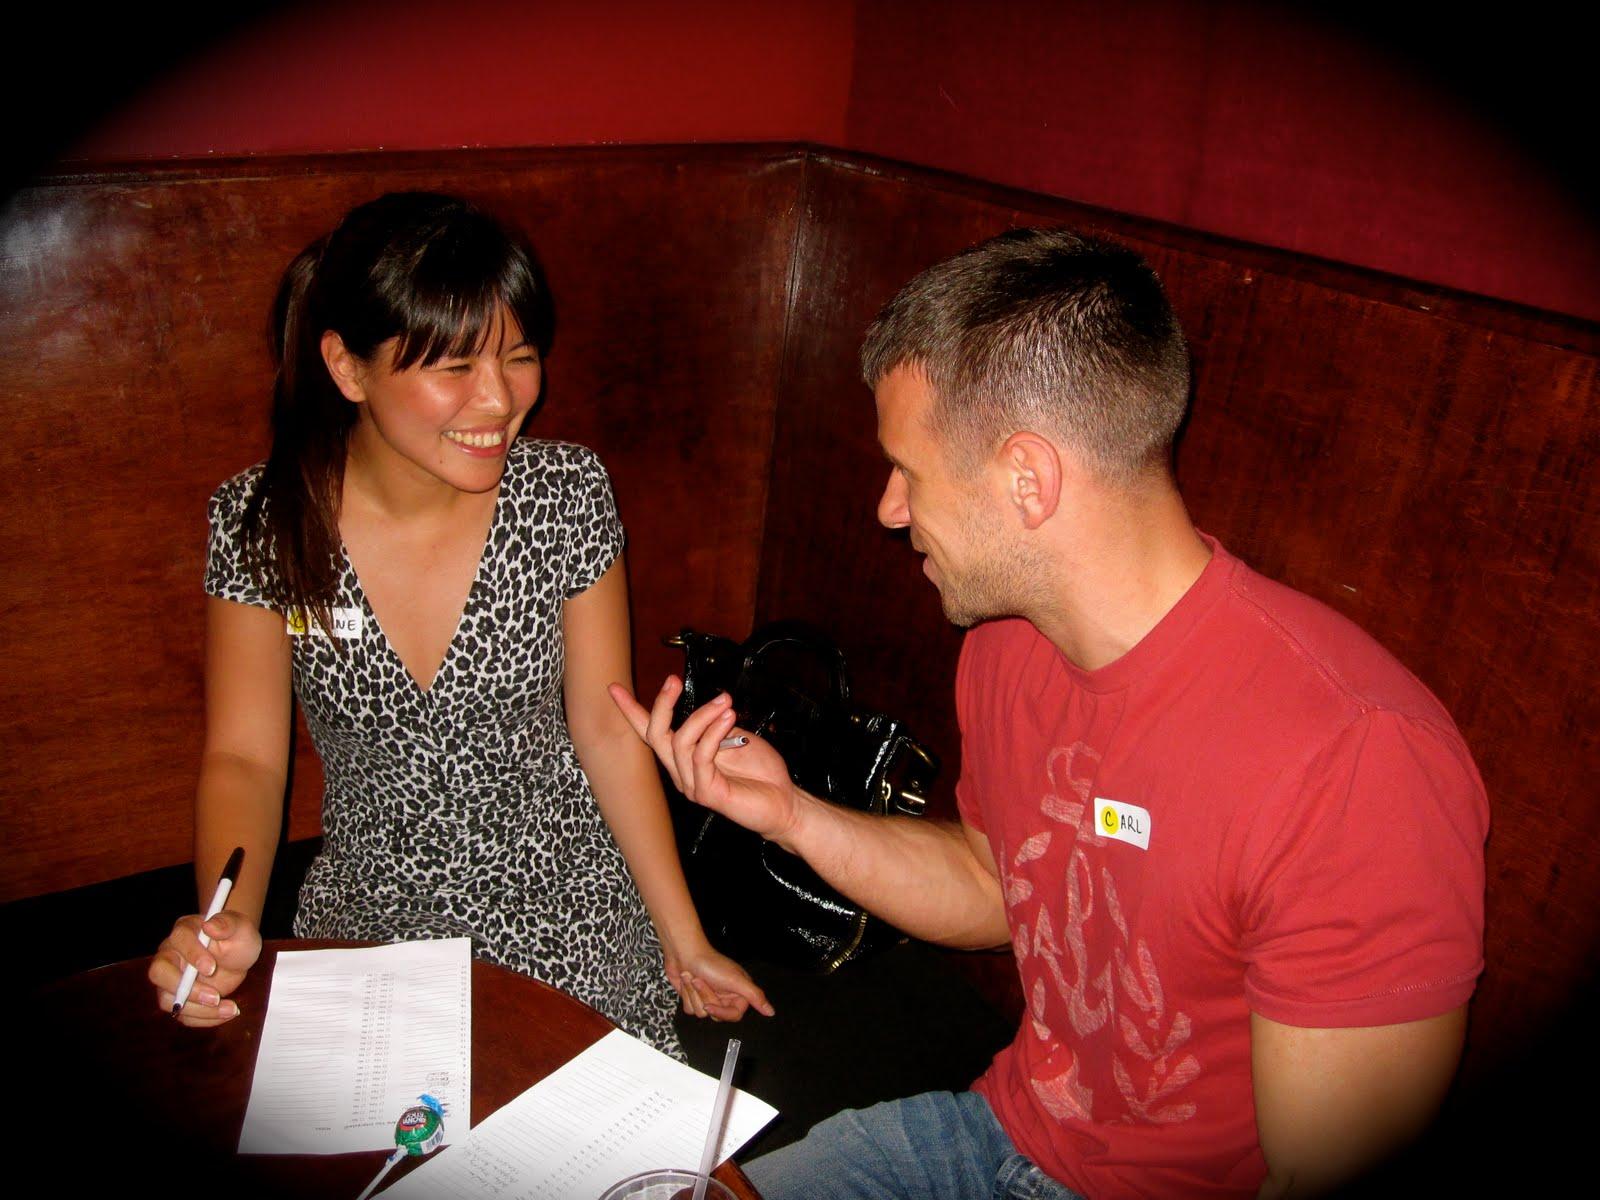 Most Embarrassing Types of Profile Pics - datingadvicecom